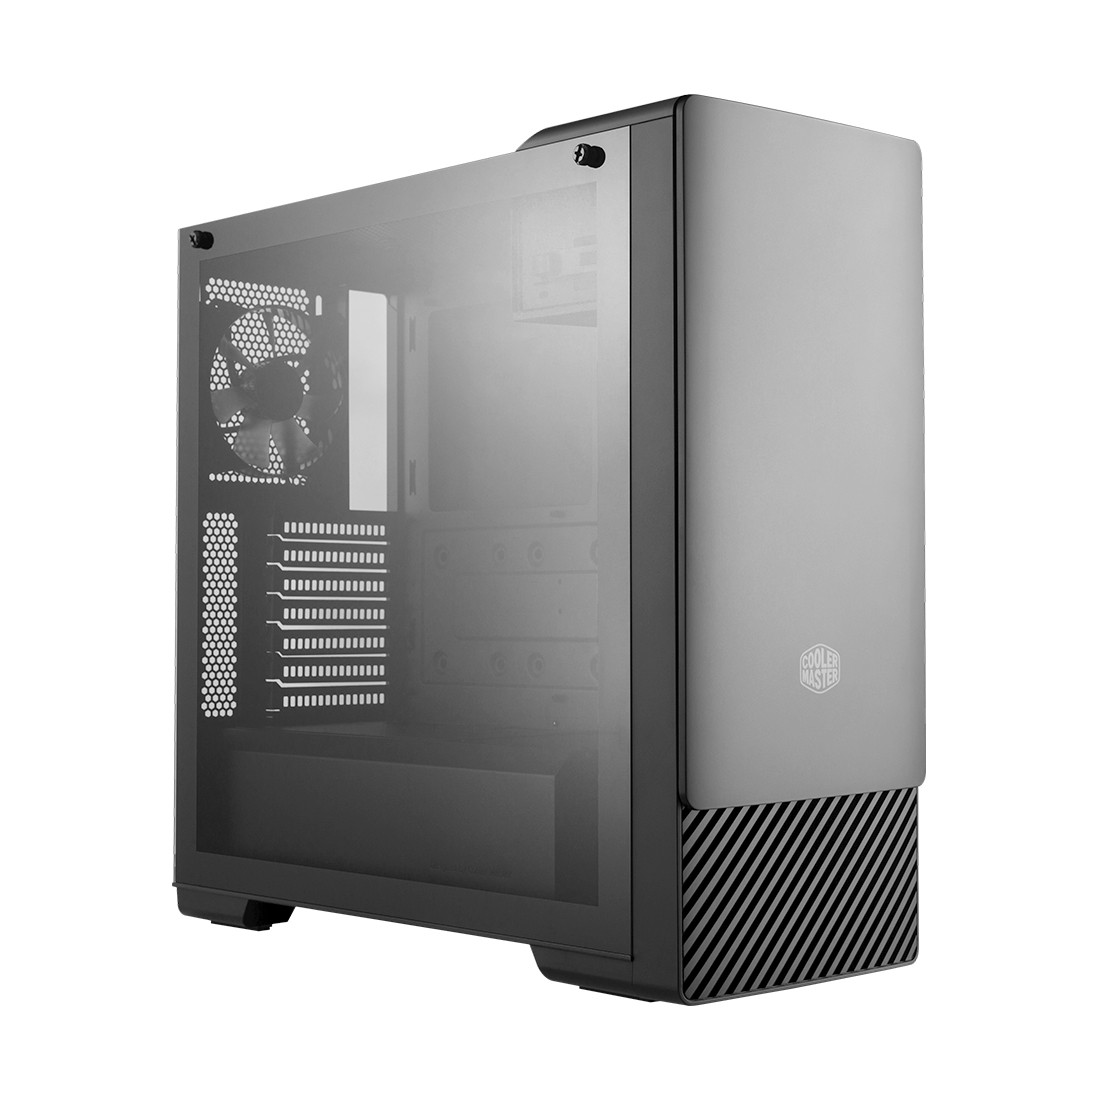 Компьютерный корпус Cooler Master MasterBox E500 (MCB-E500-KG5N-S00)